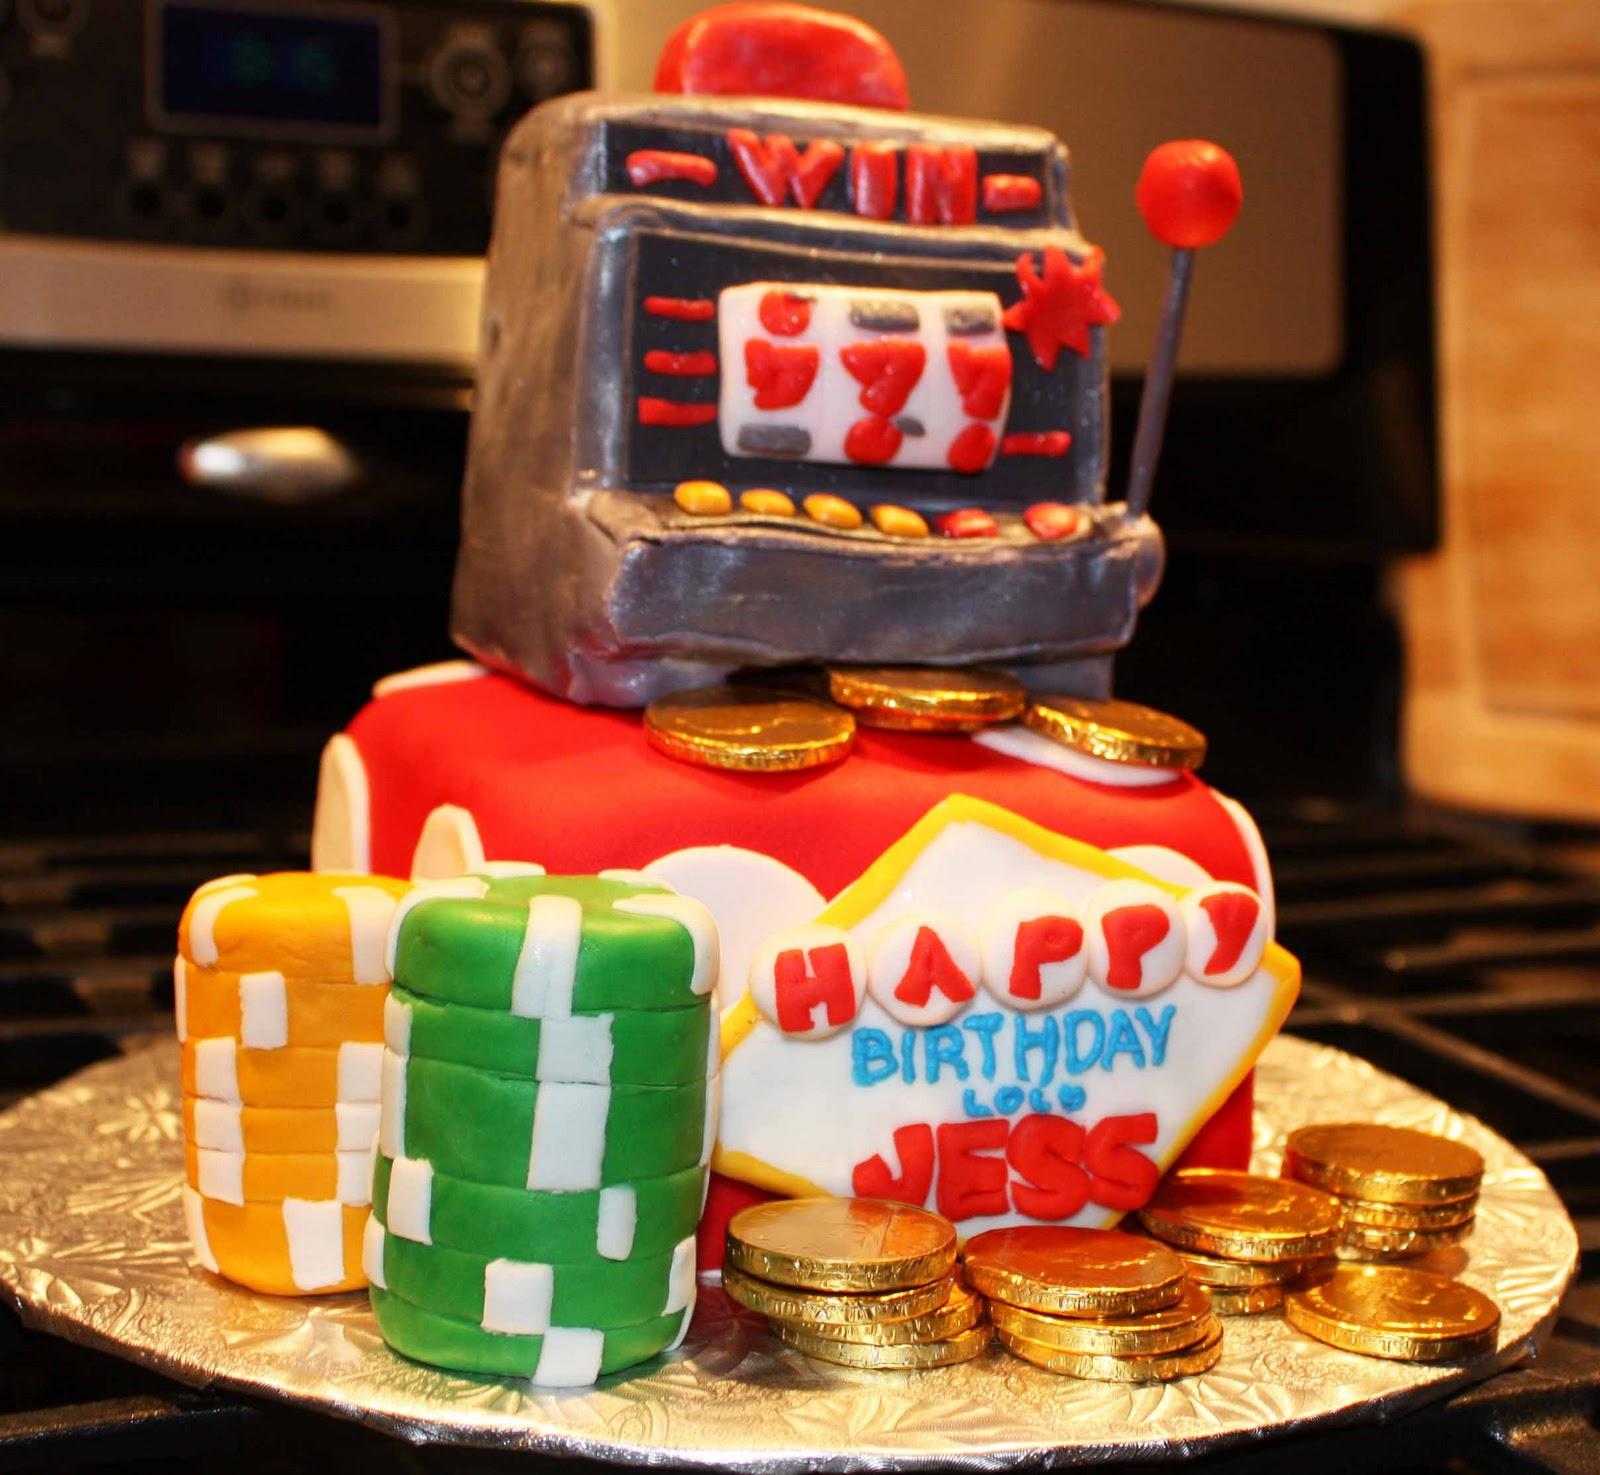 Happy Birthday Slot Machine Cake